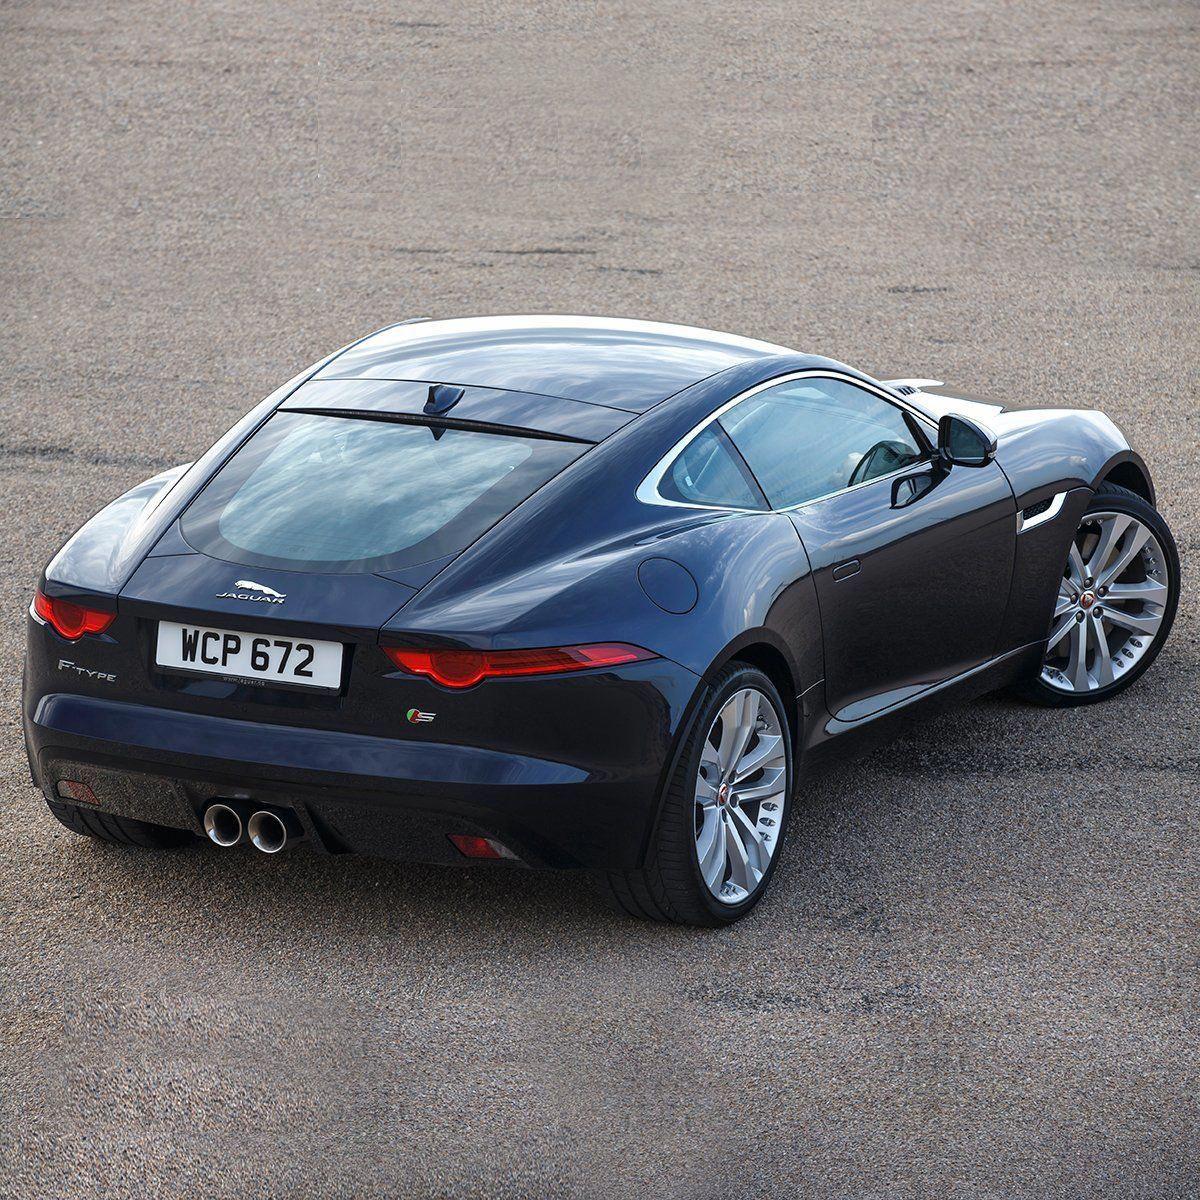 F Type Jaguarclassiccars Jaguar F Type Jaguar Car Jaguar